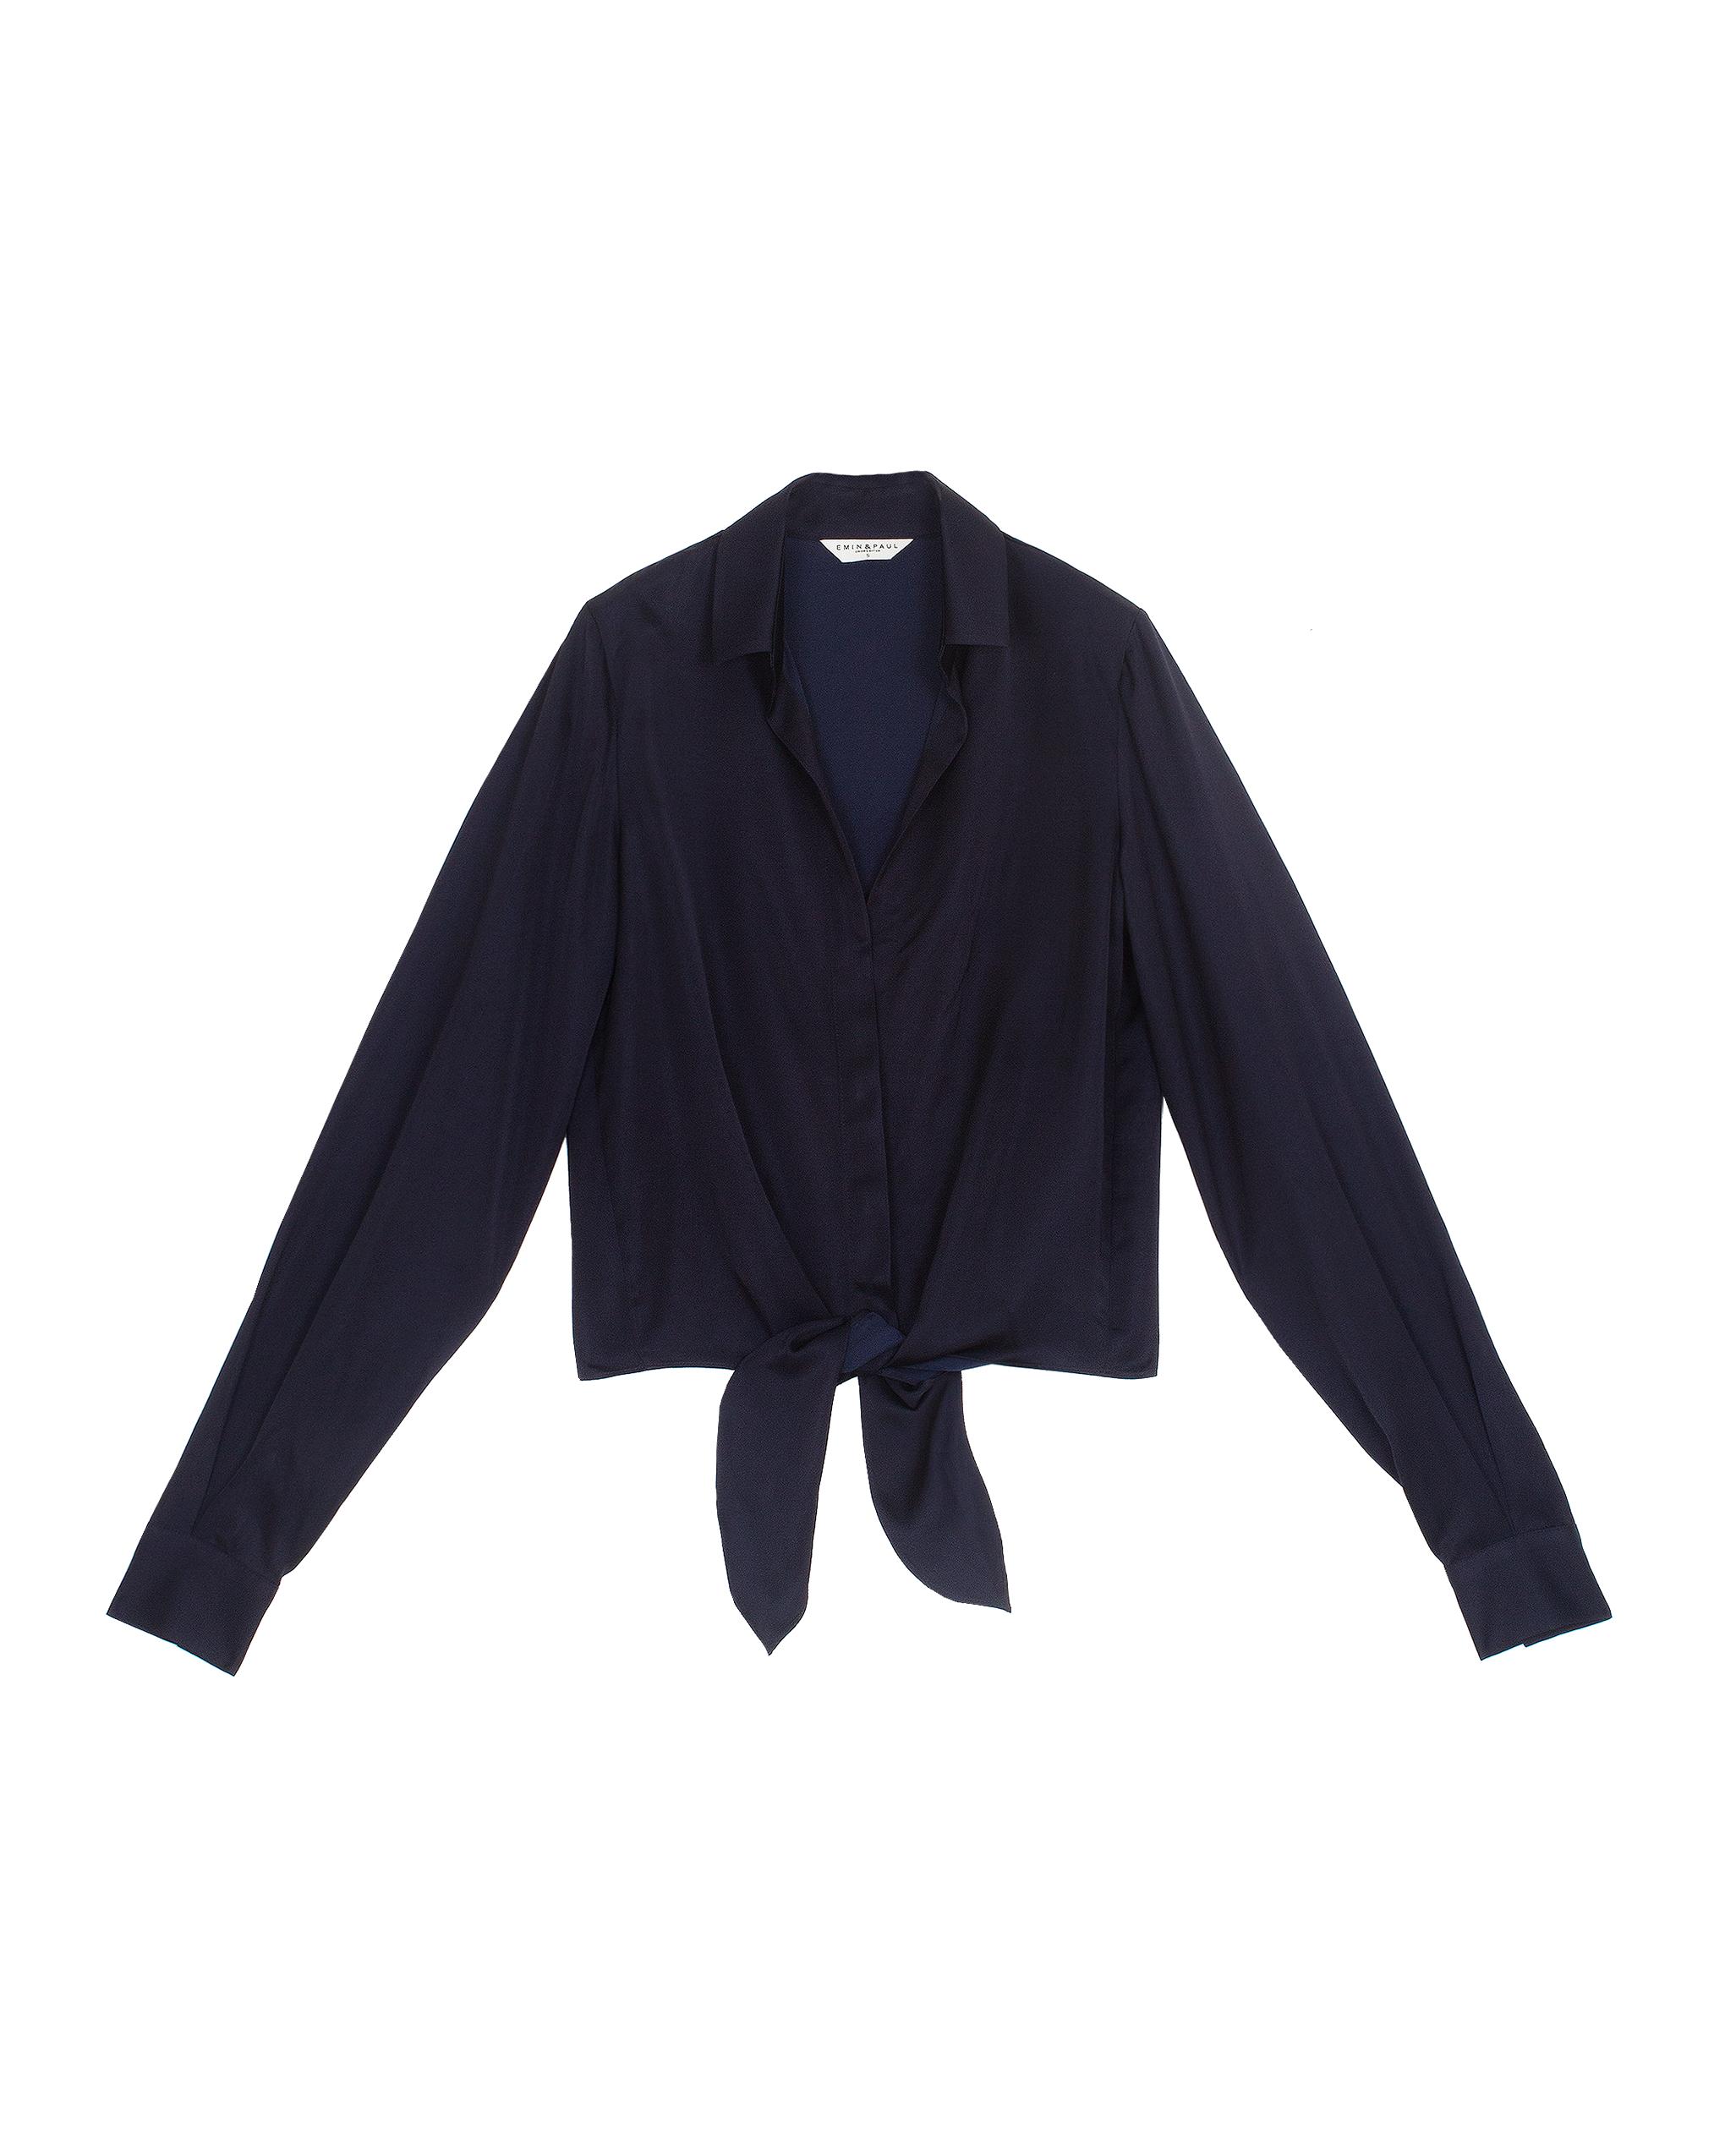 EMIN + PAUL navy tie-front blouse.